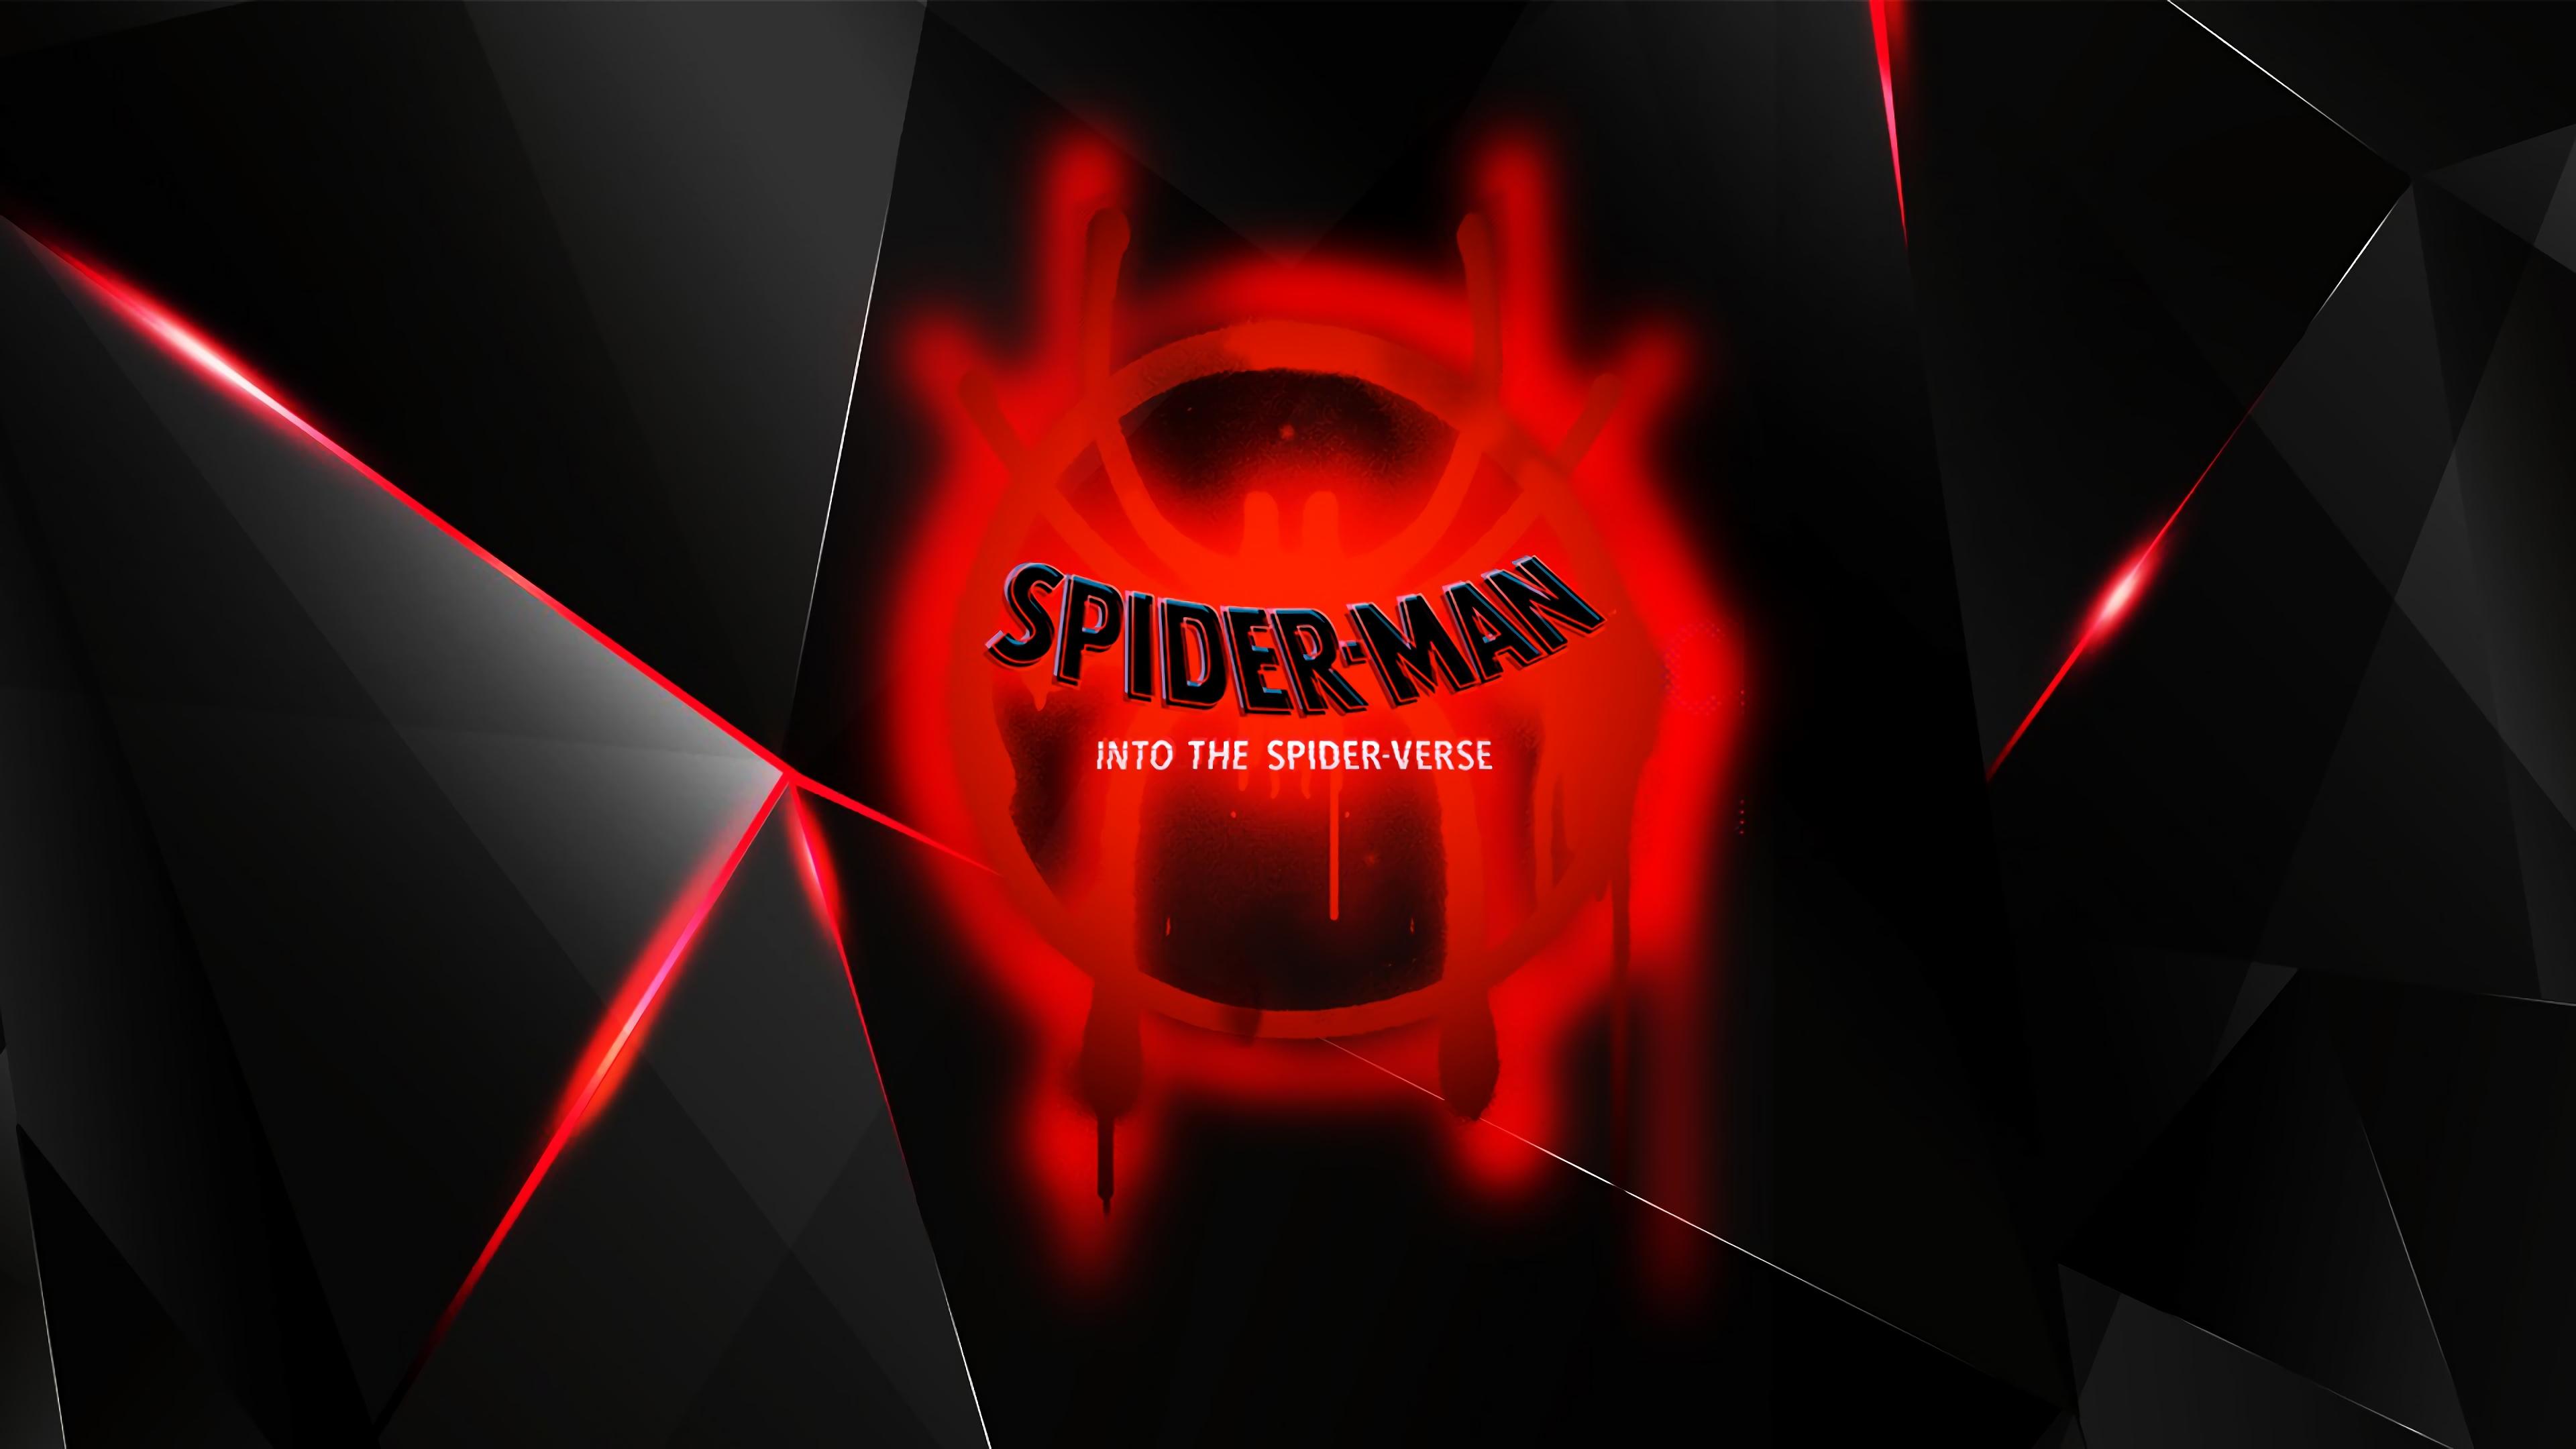 Wallpaper 4k Spiderman Into The Spider Verse Movie 2018 Logo 2018